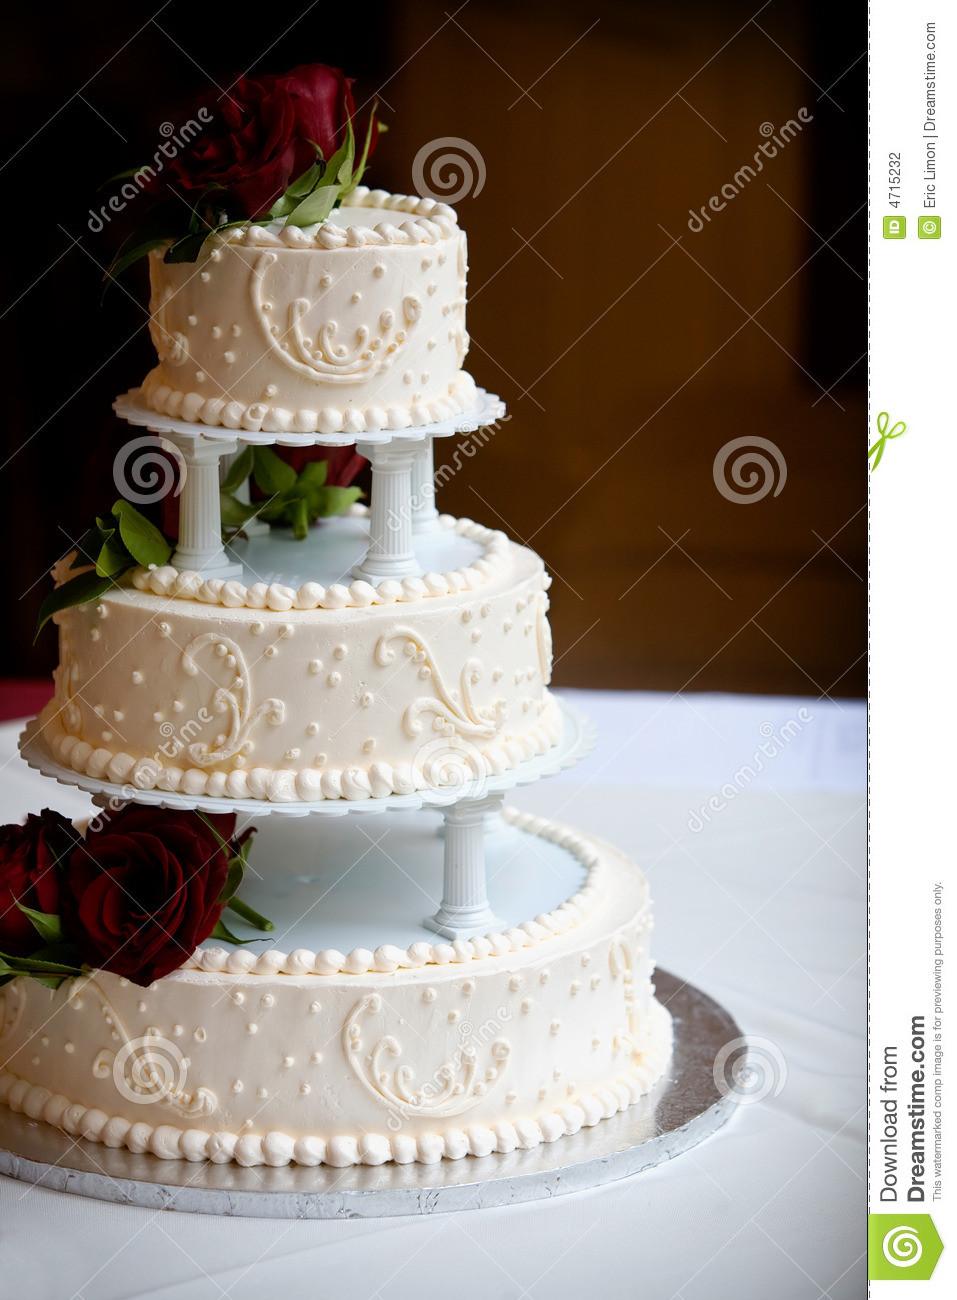 Three Tear Wedding Cakes  Wedding Cake With Three Tiers Stock Image of